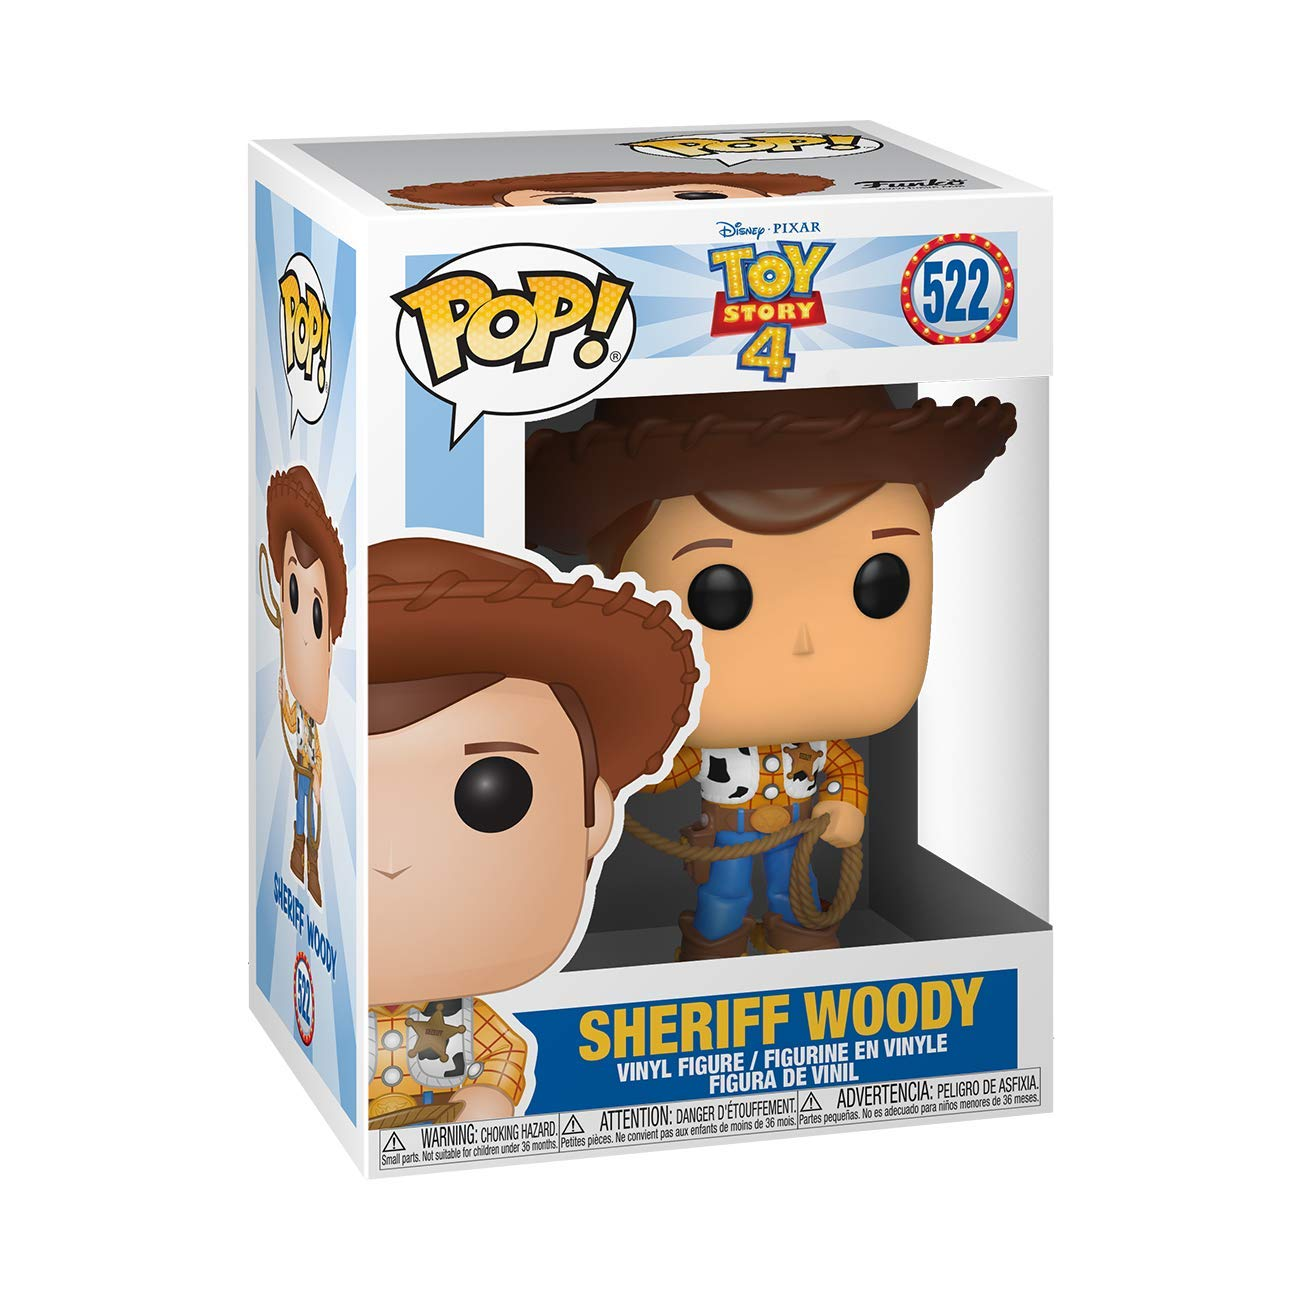 Funko- Pop Vinilo: Disney: Toy Story 4: Woody Figura Coleccionable, Multicolor (37383)